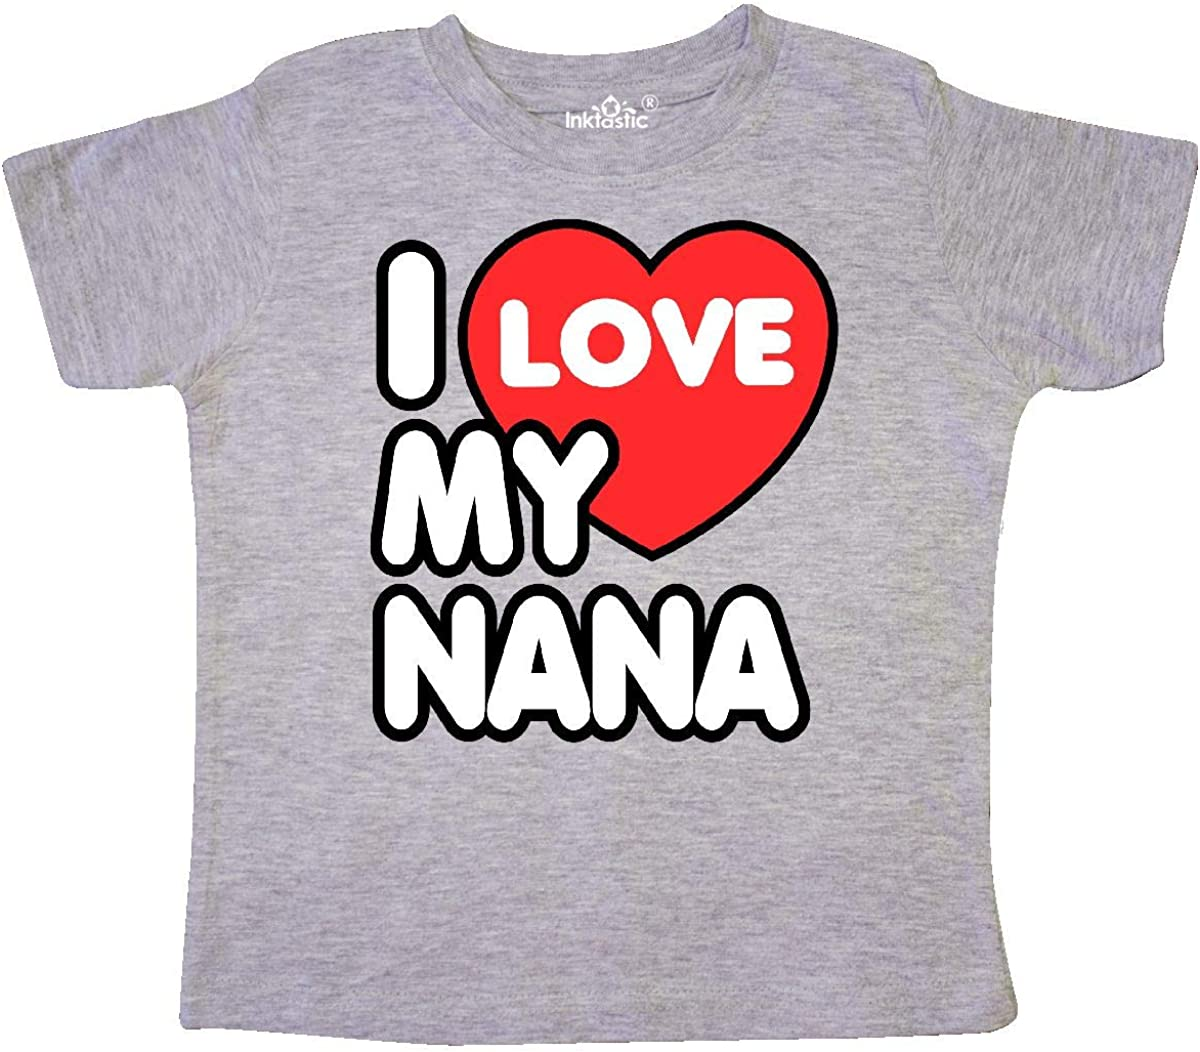 inktastic I Love My Nana Toddler T-Shirt